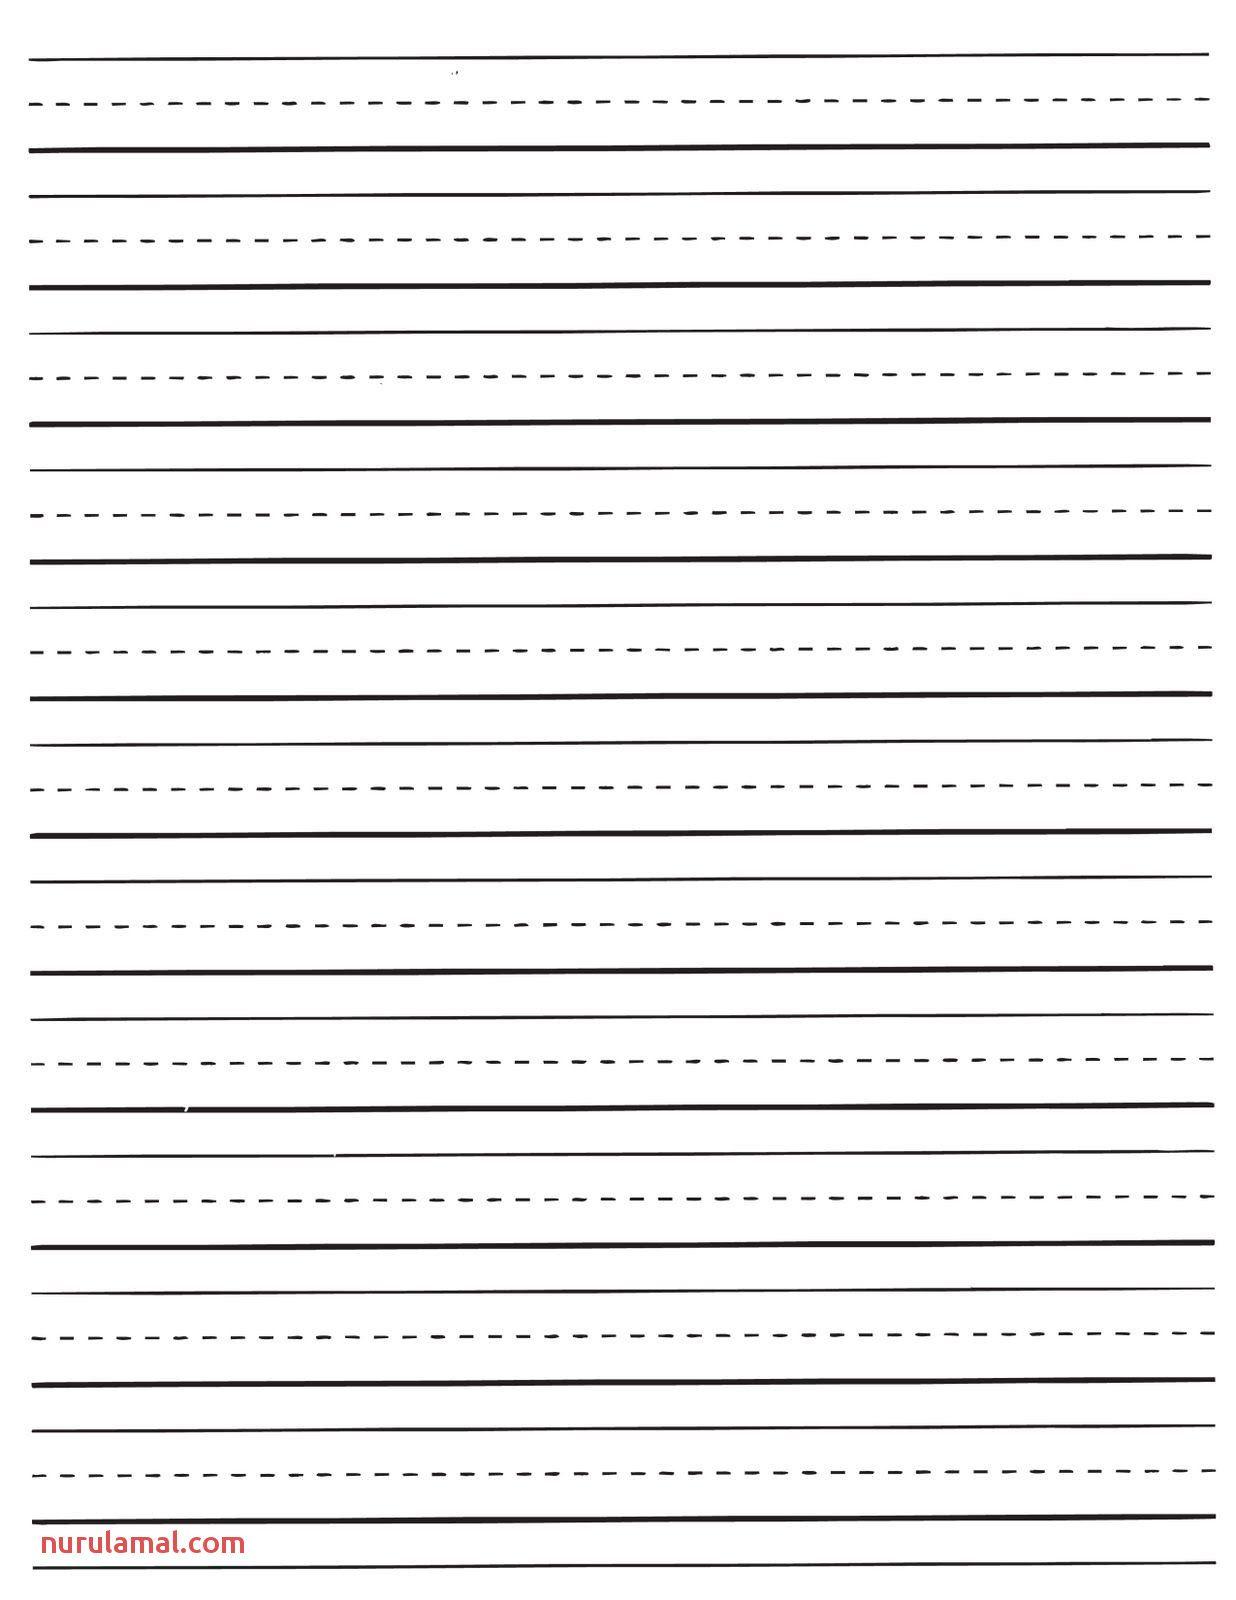 Printable Handwriting Worksheets For 1st Graders In